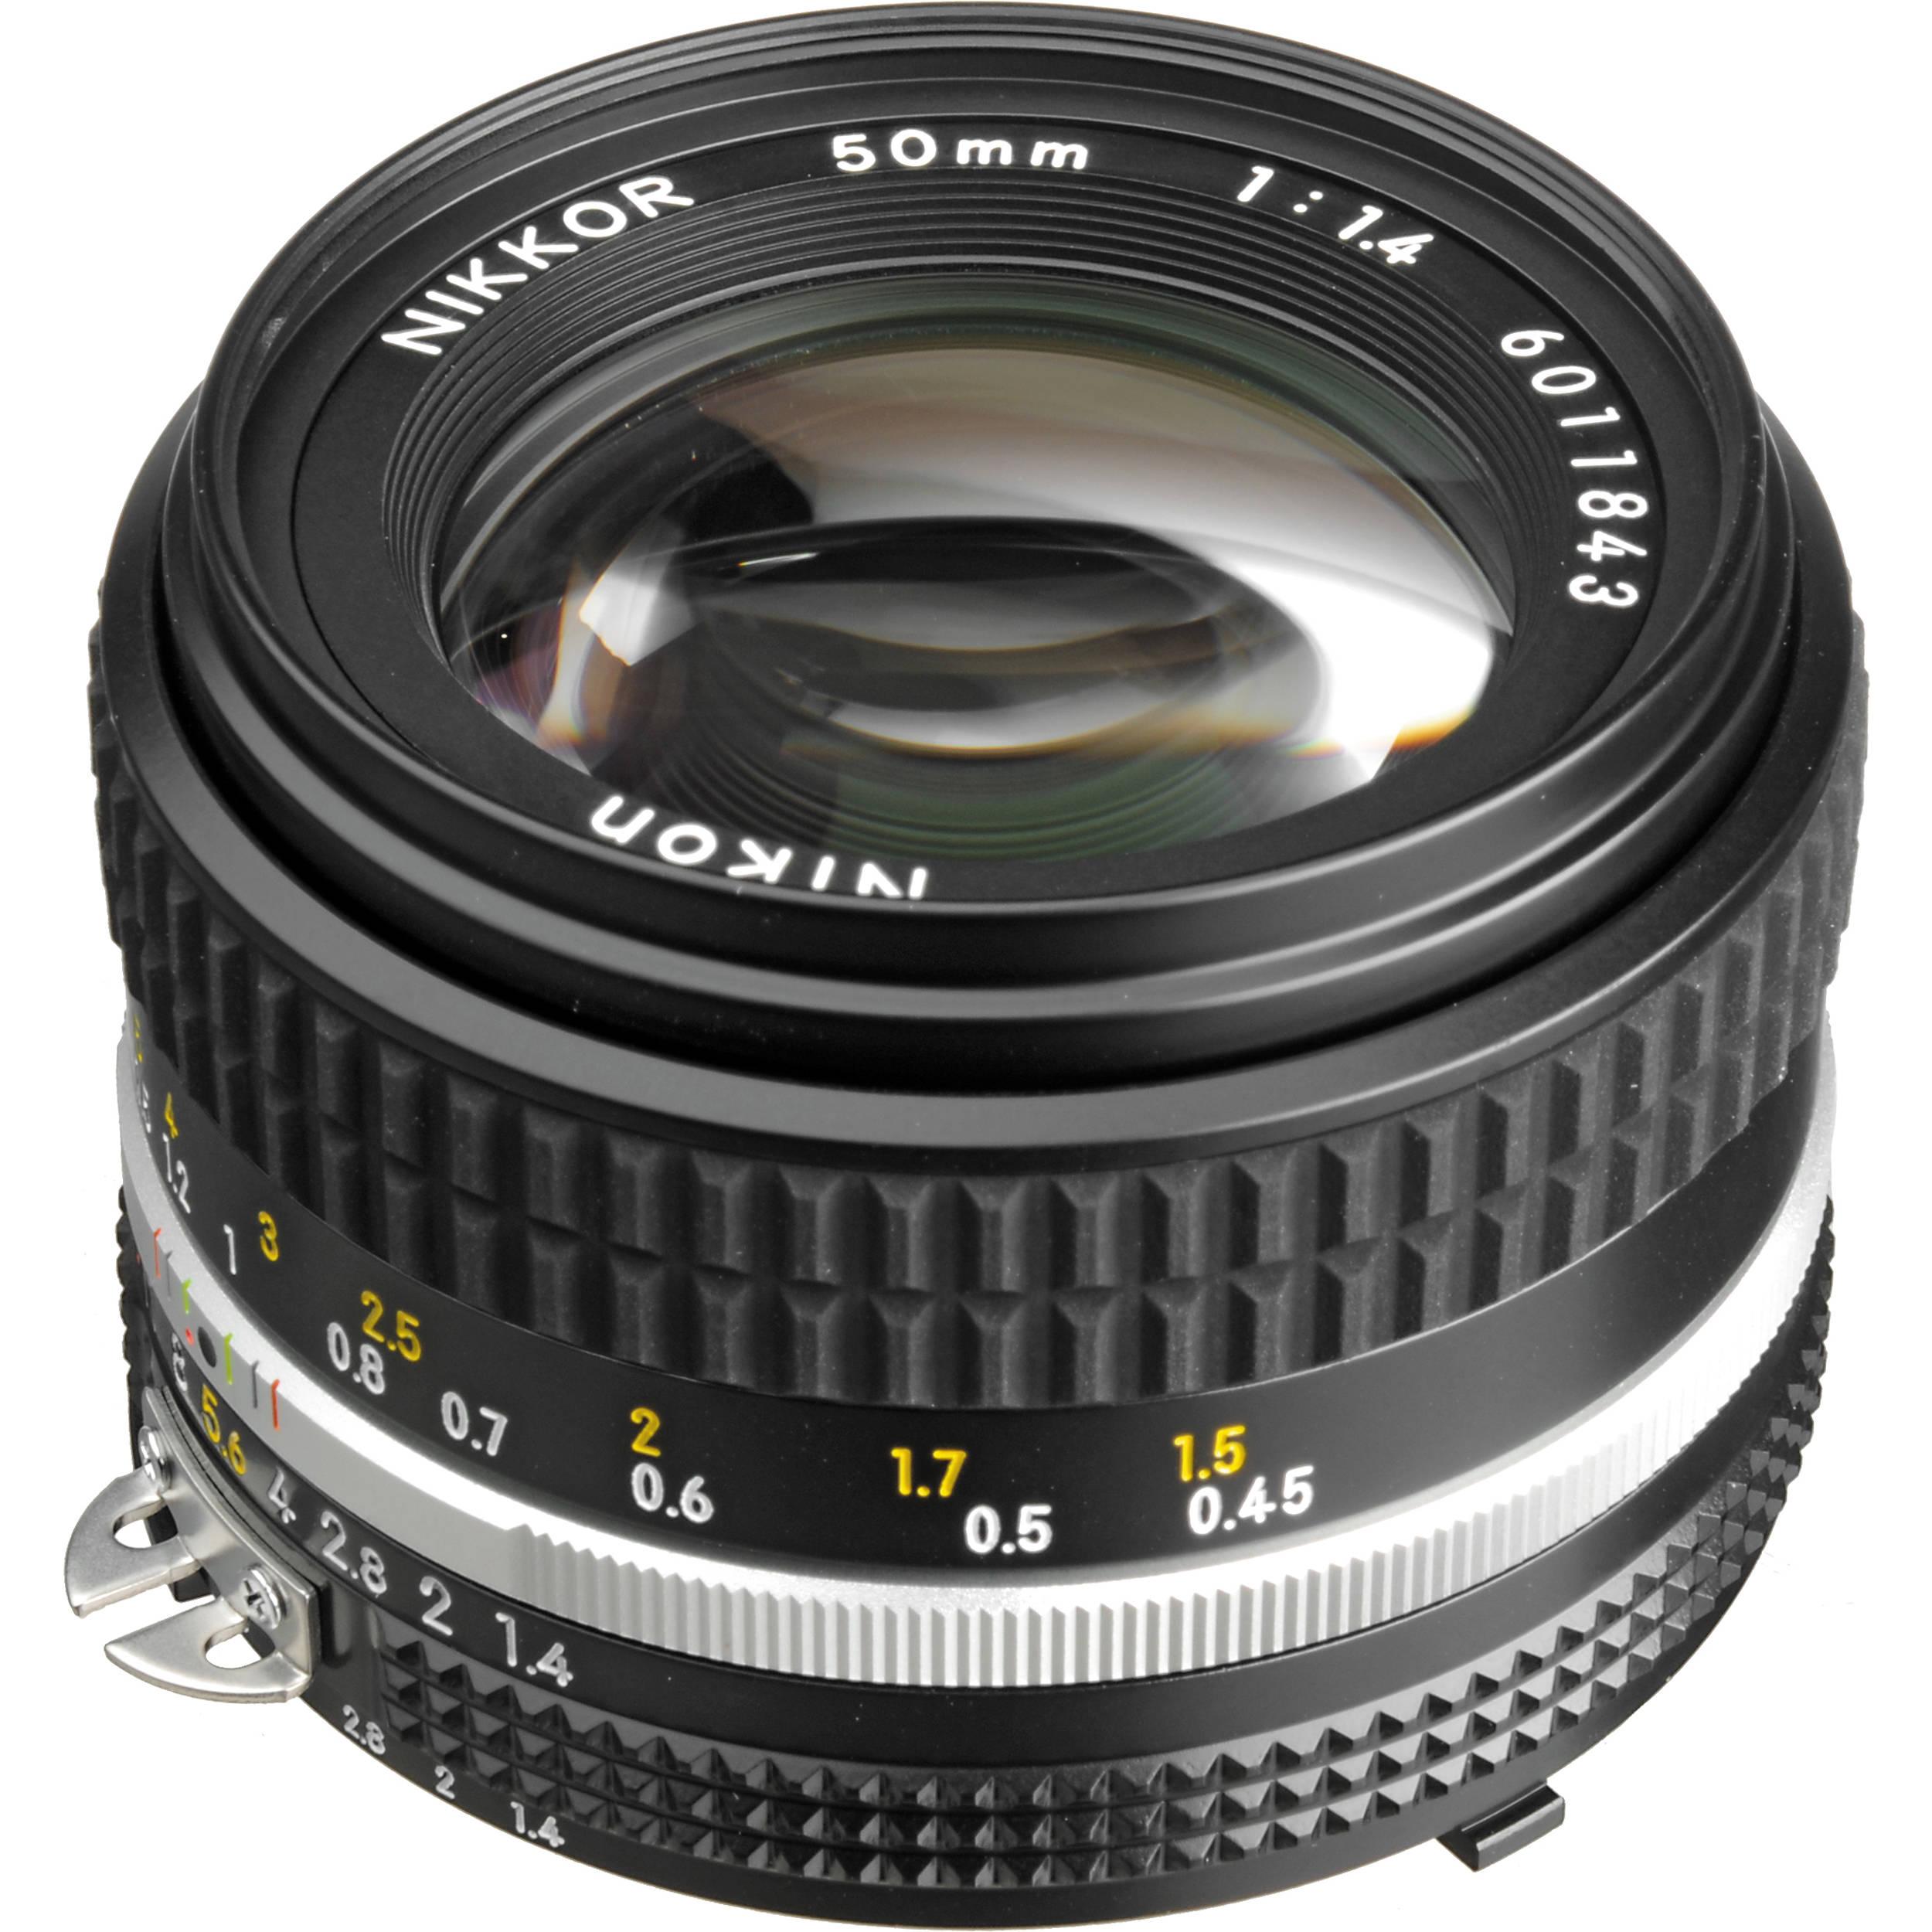 Use nikon 2870 lens